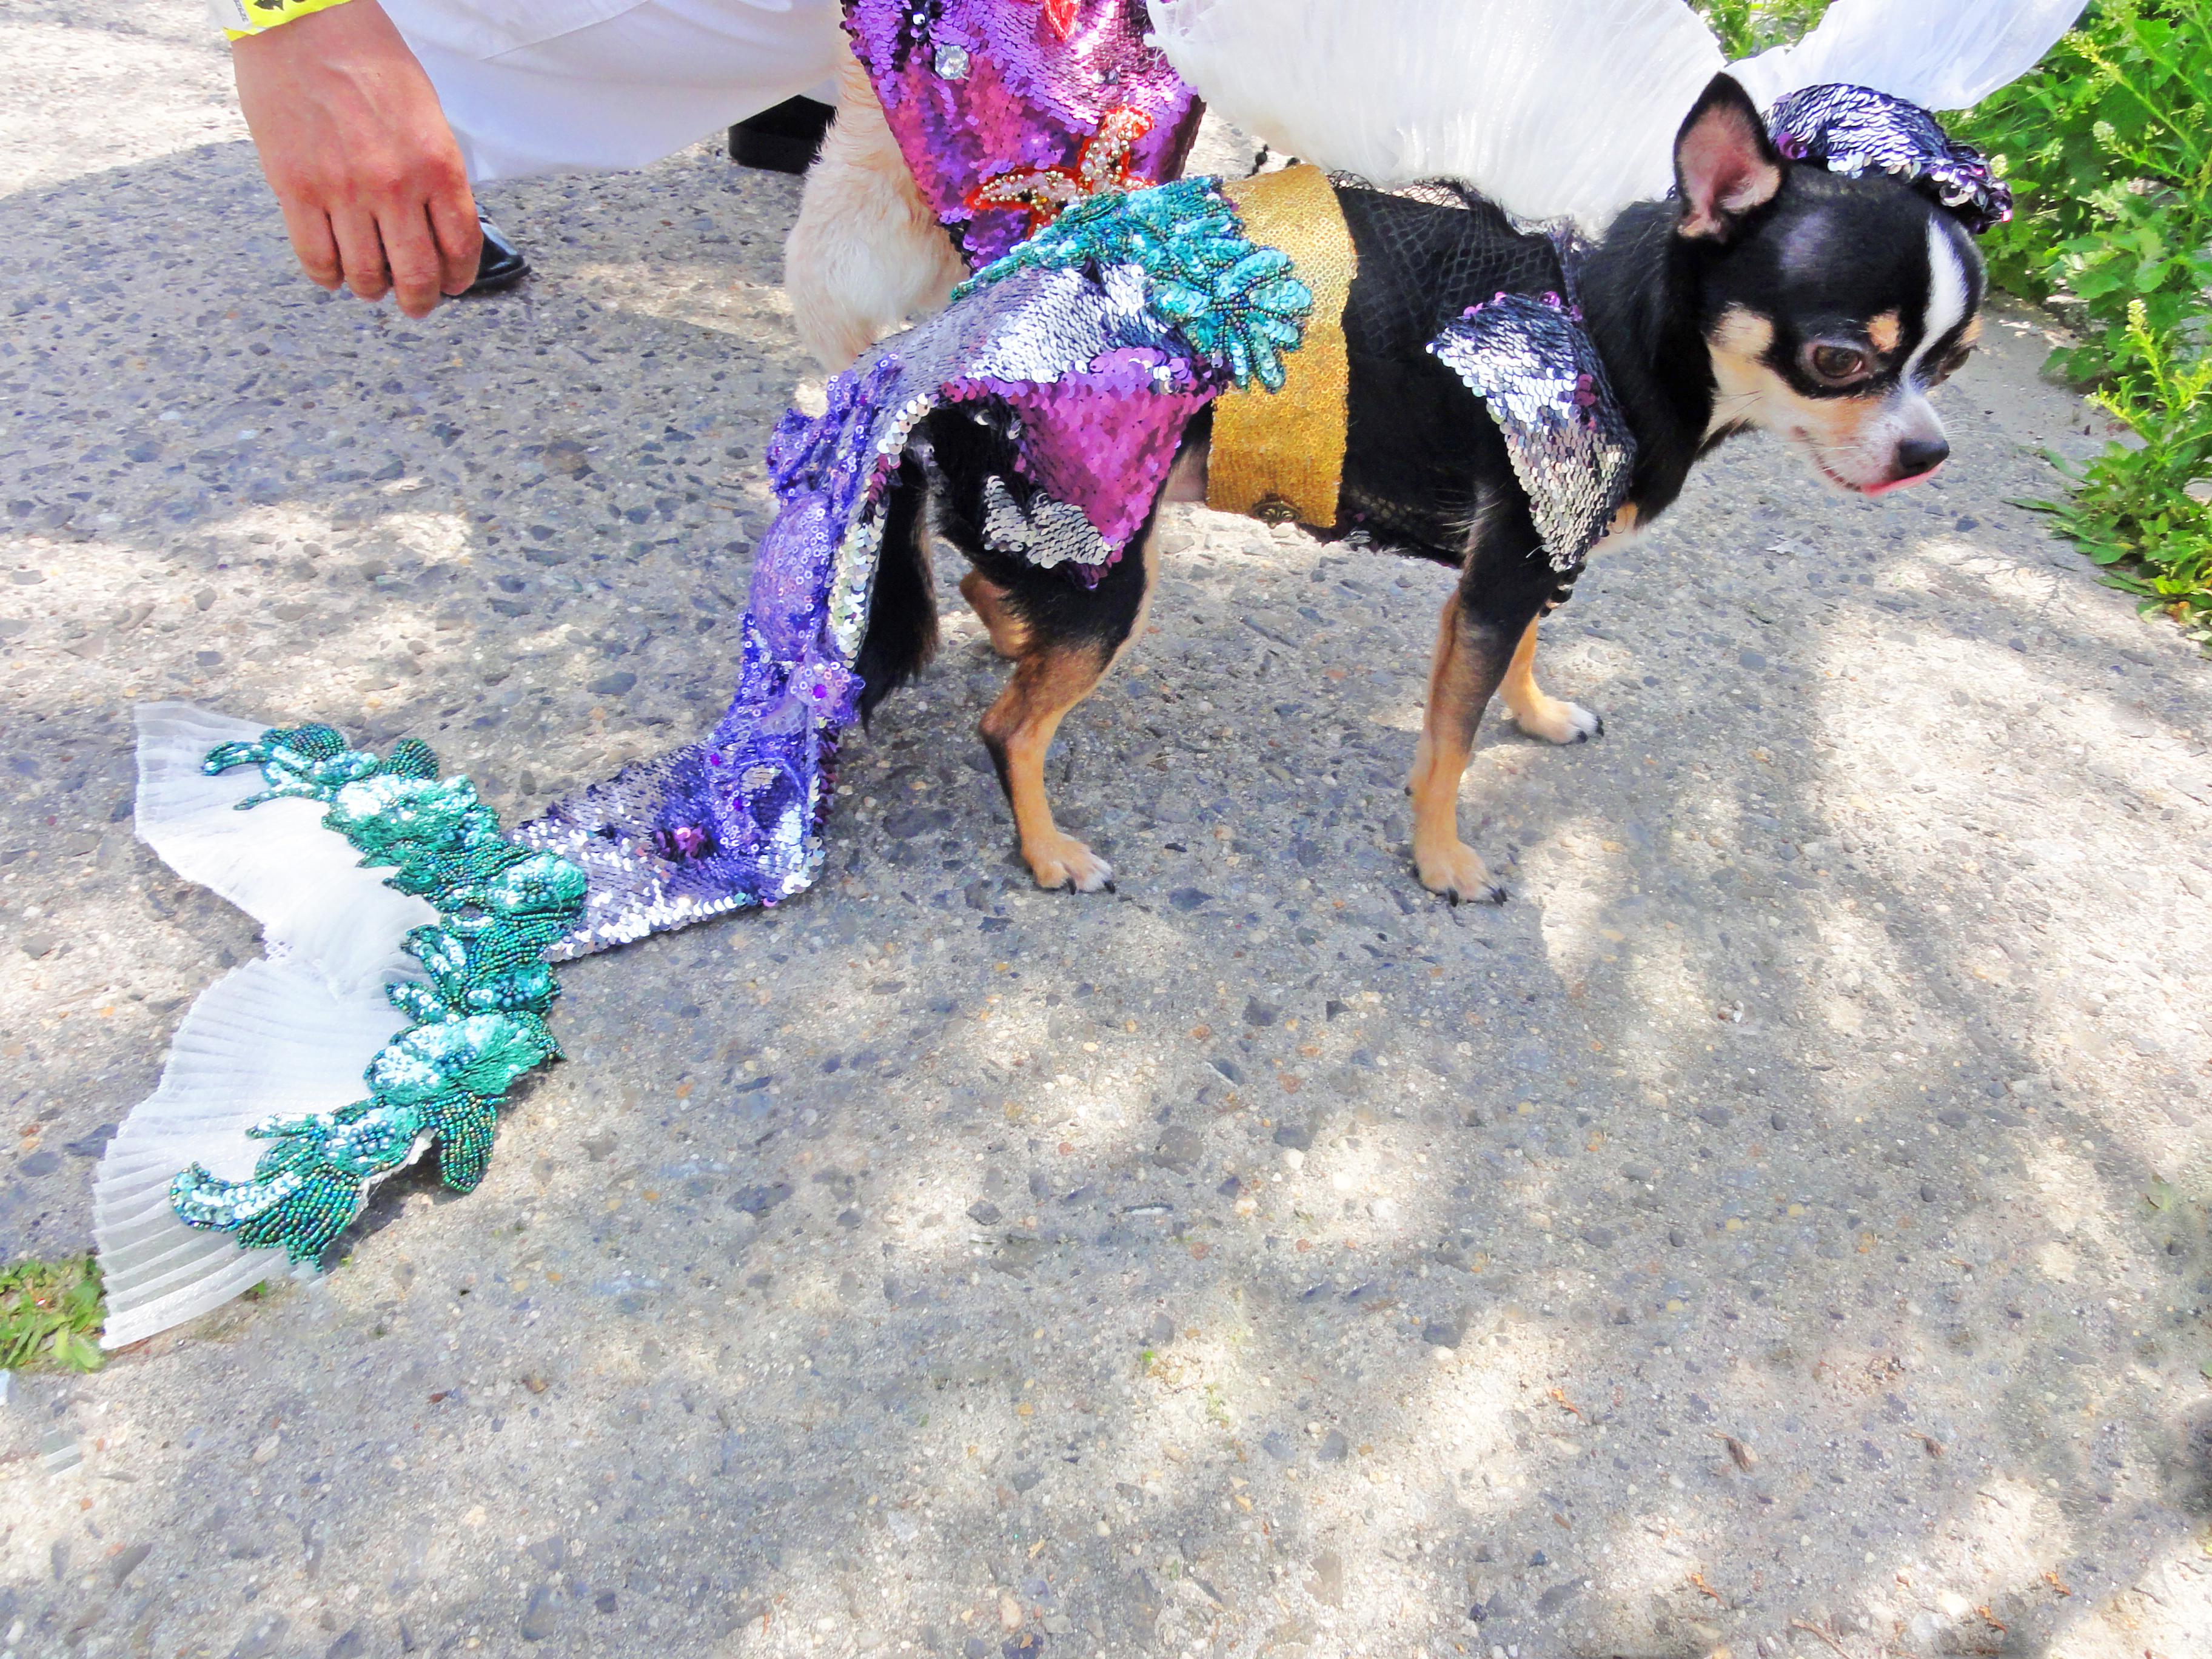 Bogie at 2013 Coney Island Mermaid Parade